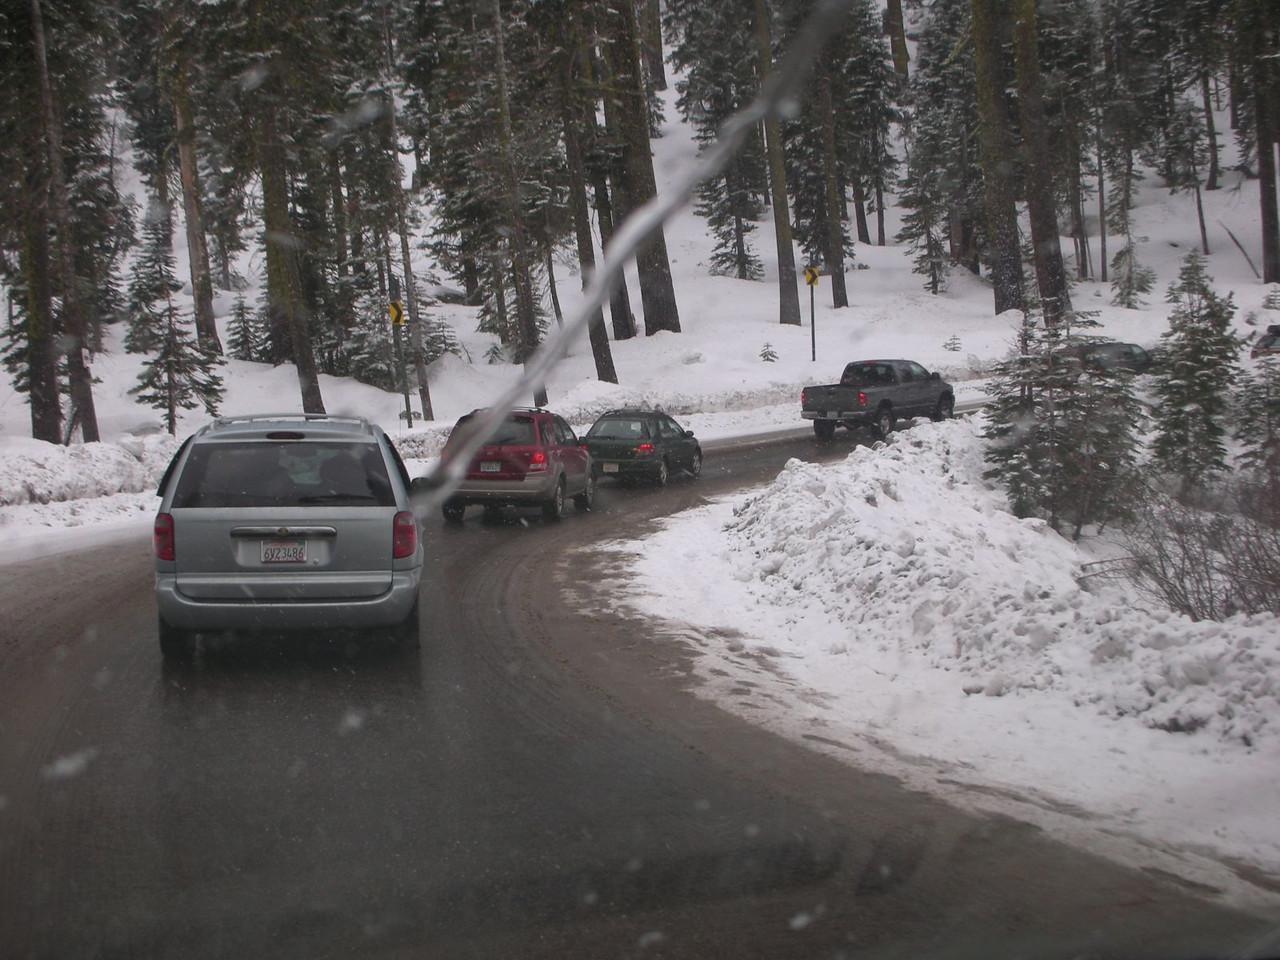 And still in traffic.....